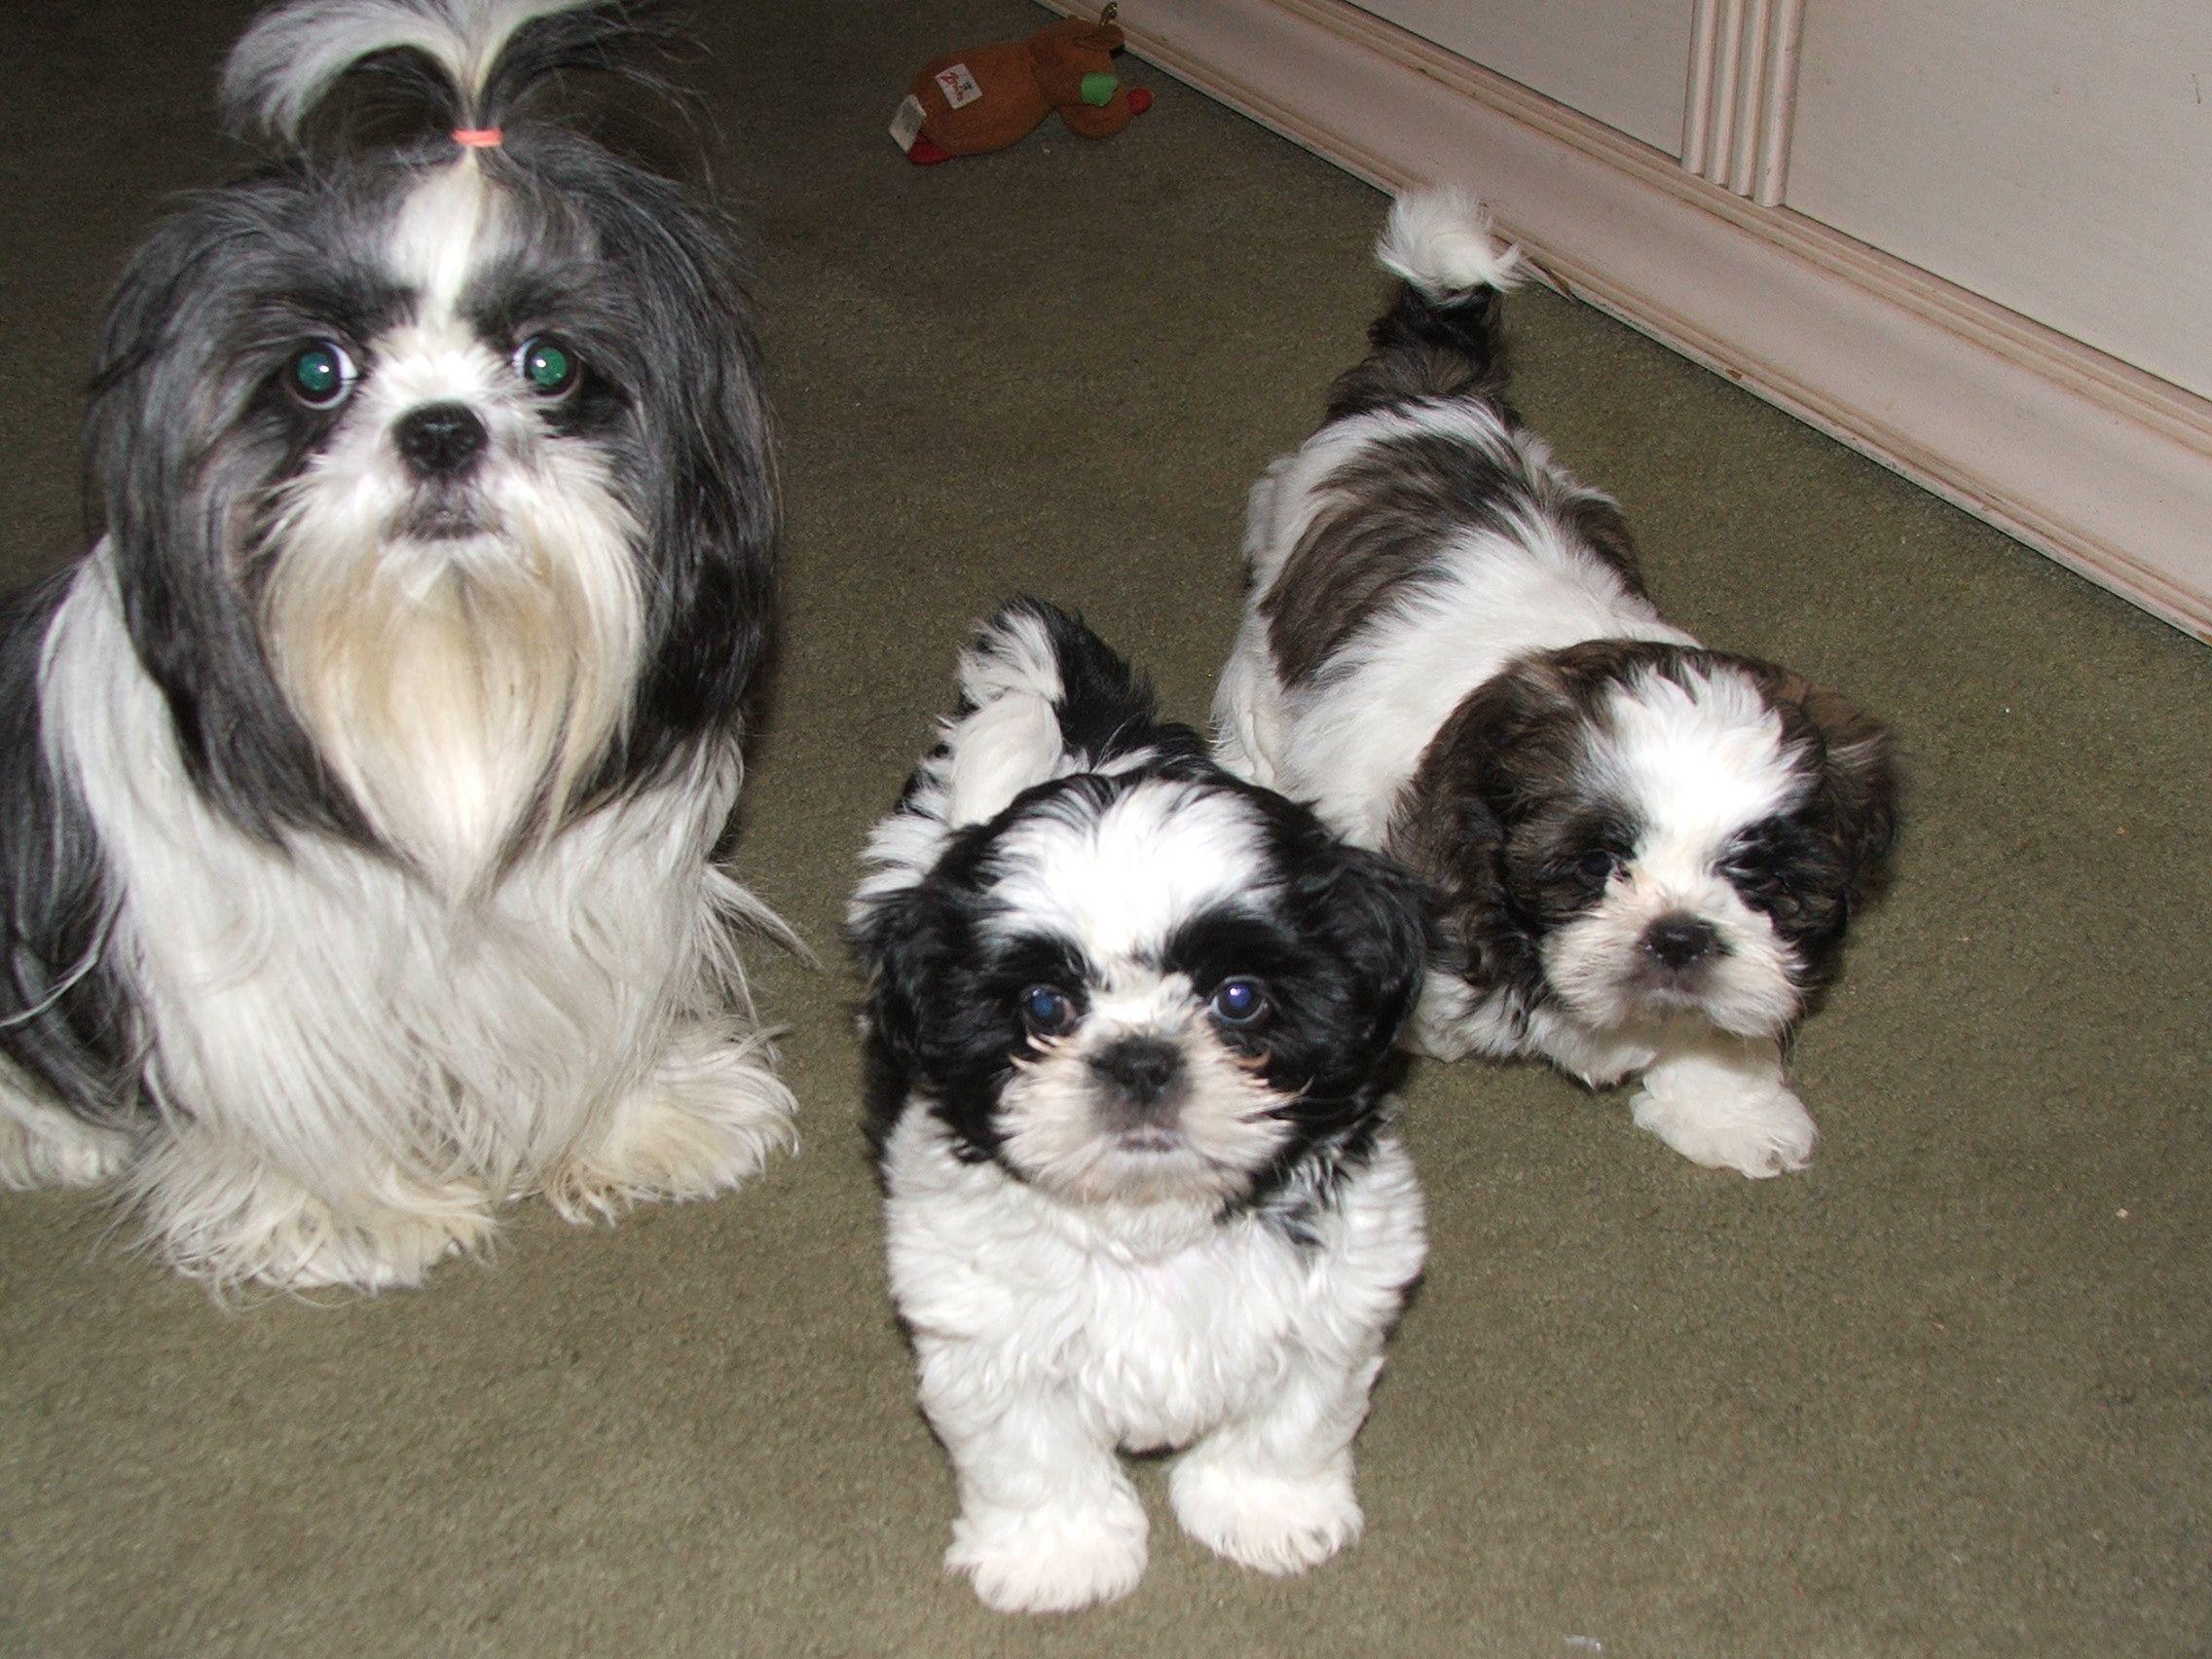 Shih Tzu Puppies For Sale In Wicket S Garage Sale Nutley Nj